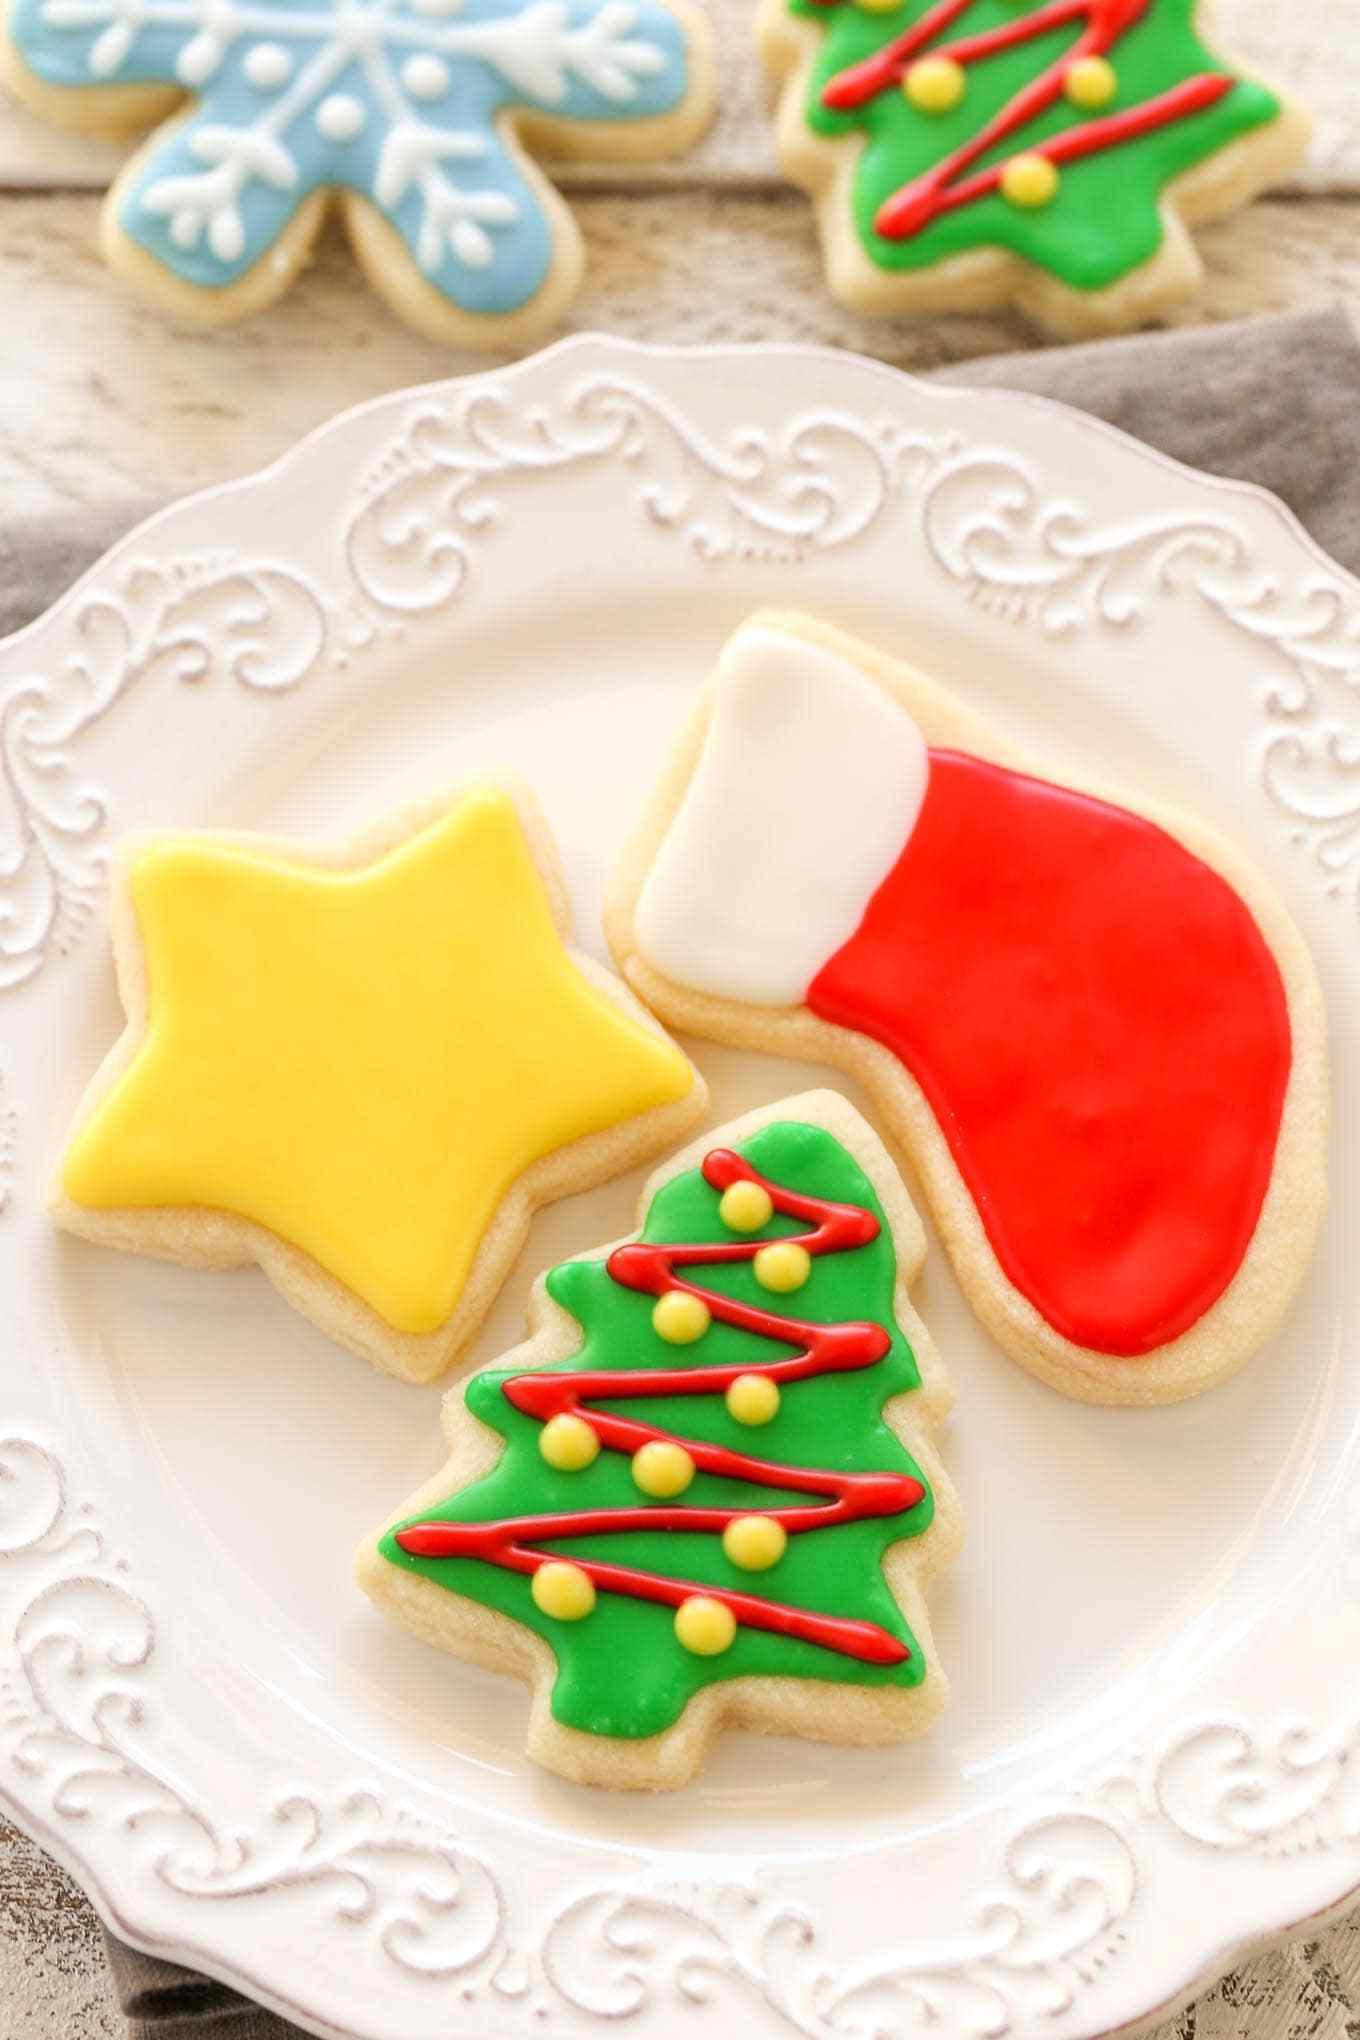 Homemade Christmas Sugar Cookies  Soft Christmas Cut Out Sugar Cookies Live Well Bake ten